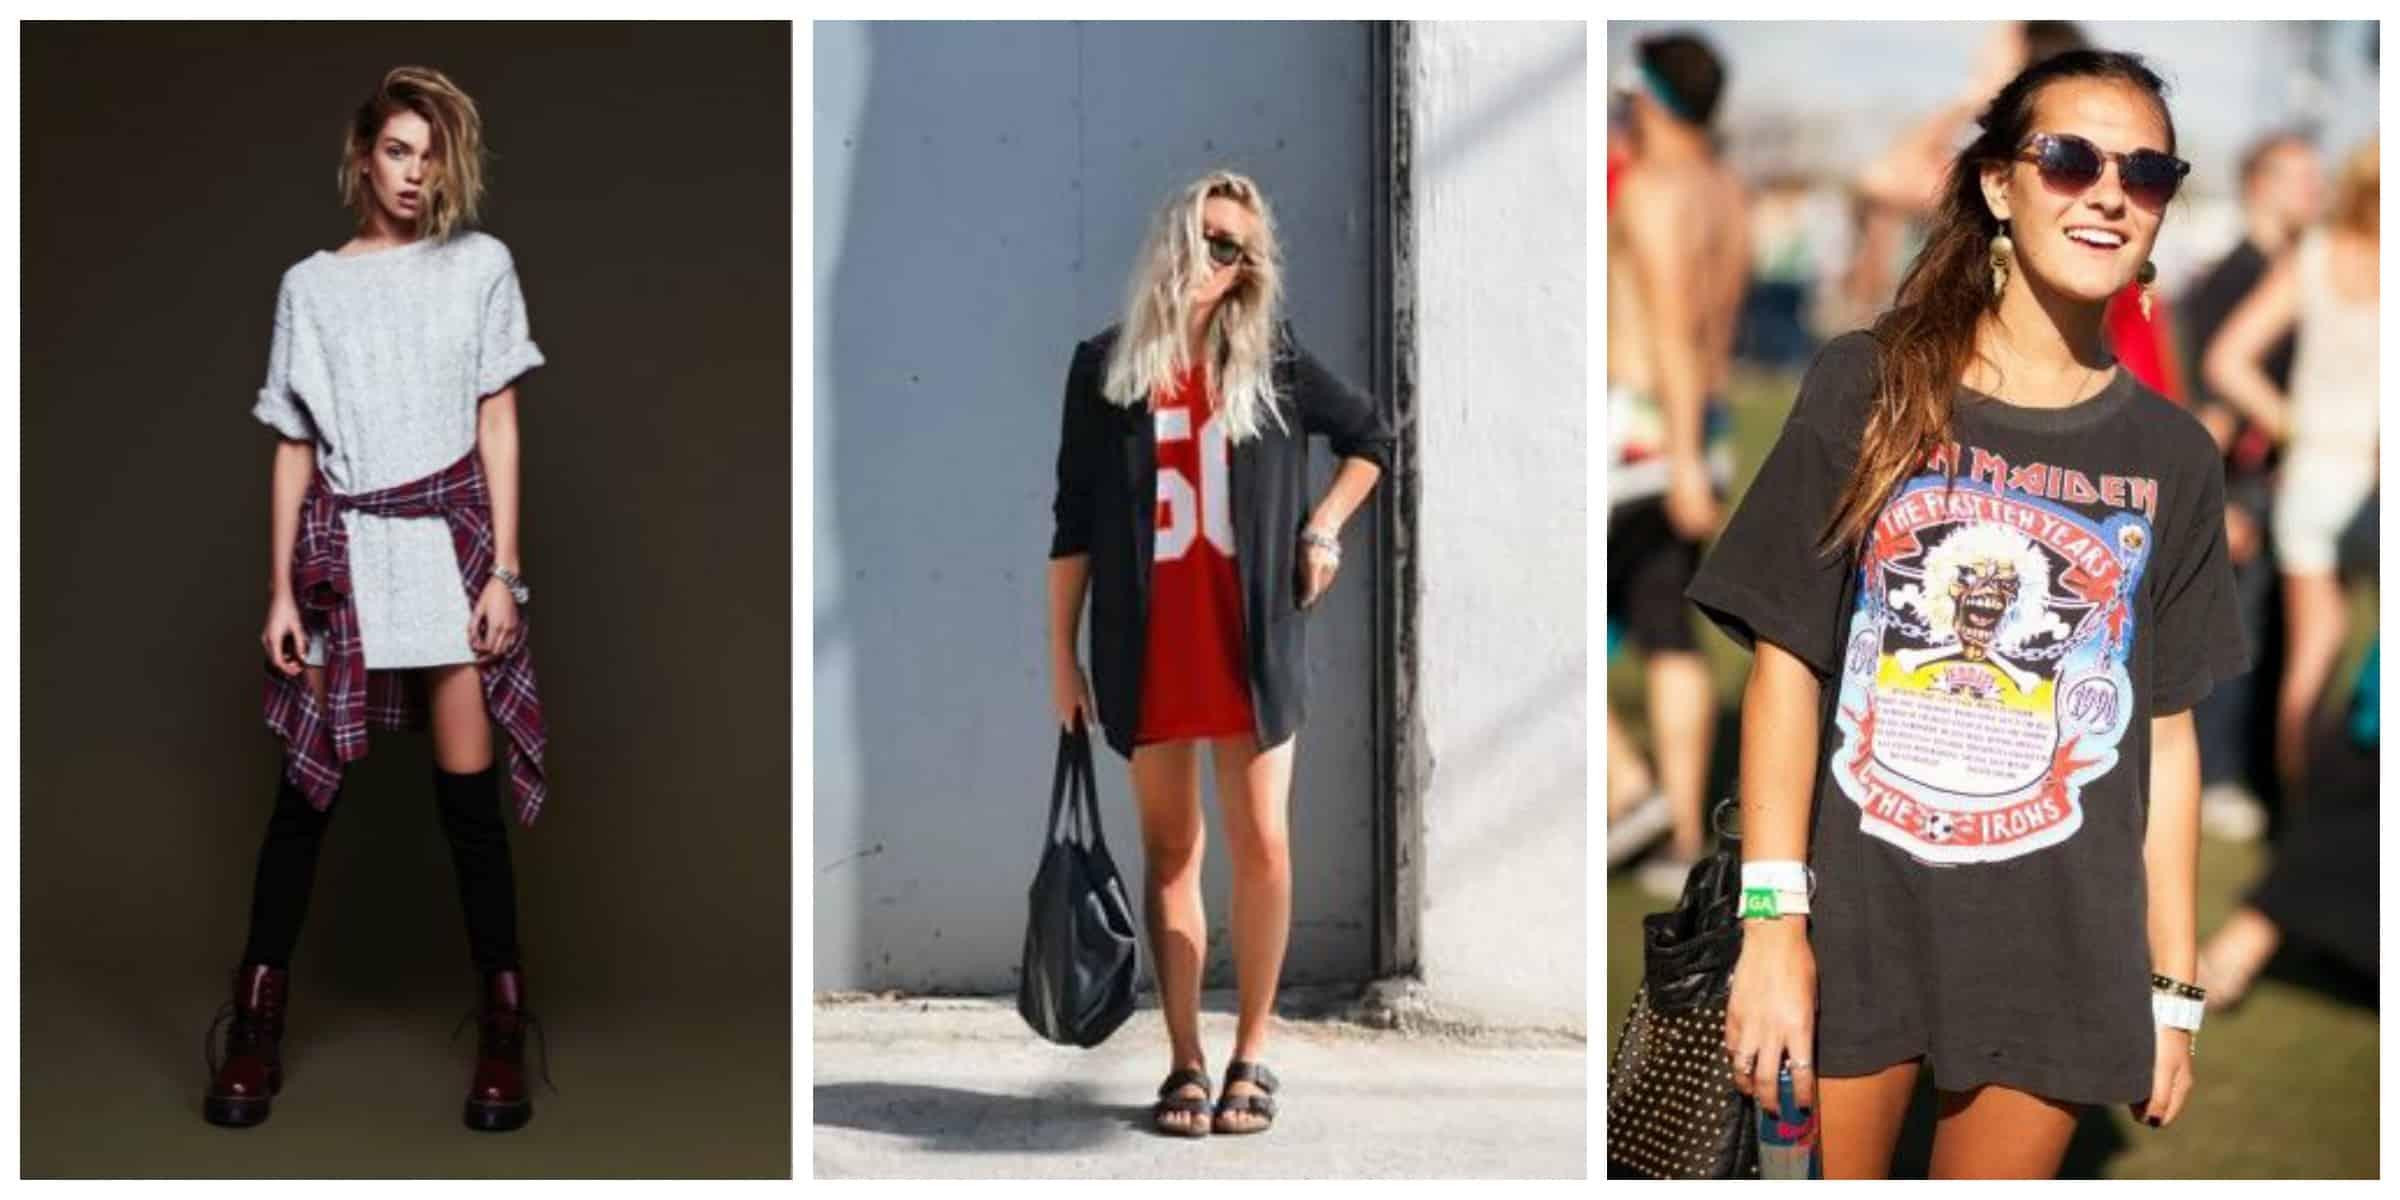 Boyfriend T Shirts 6 Ways To Make Them Look Chic Fashion Tag Blog